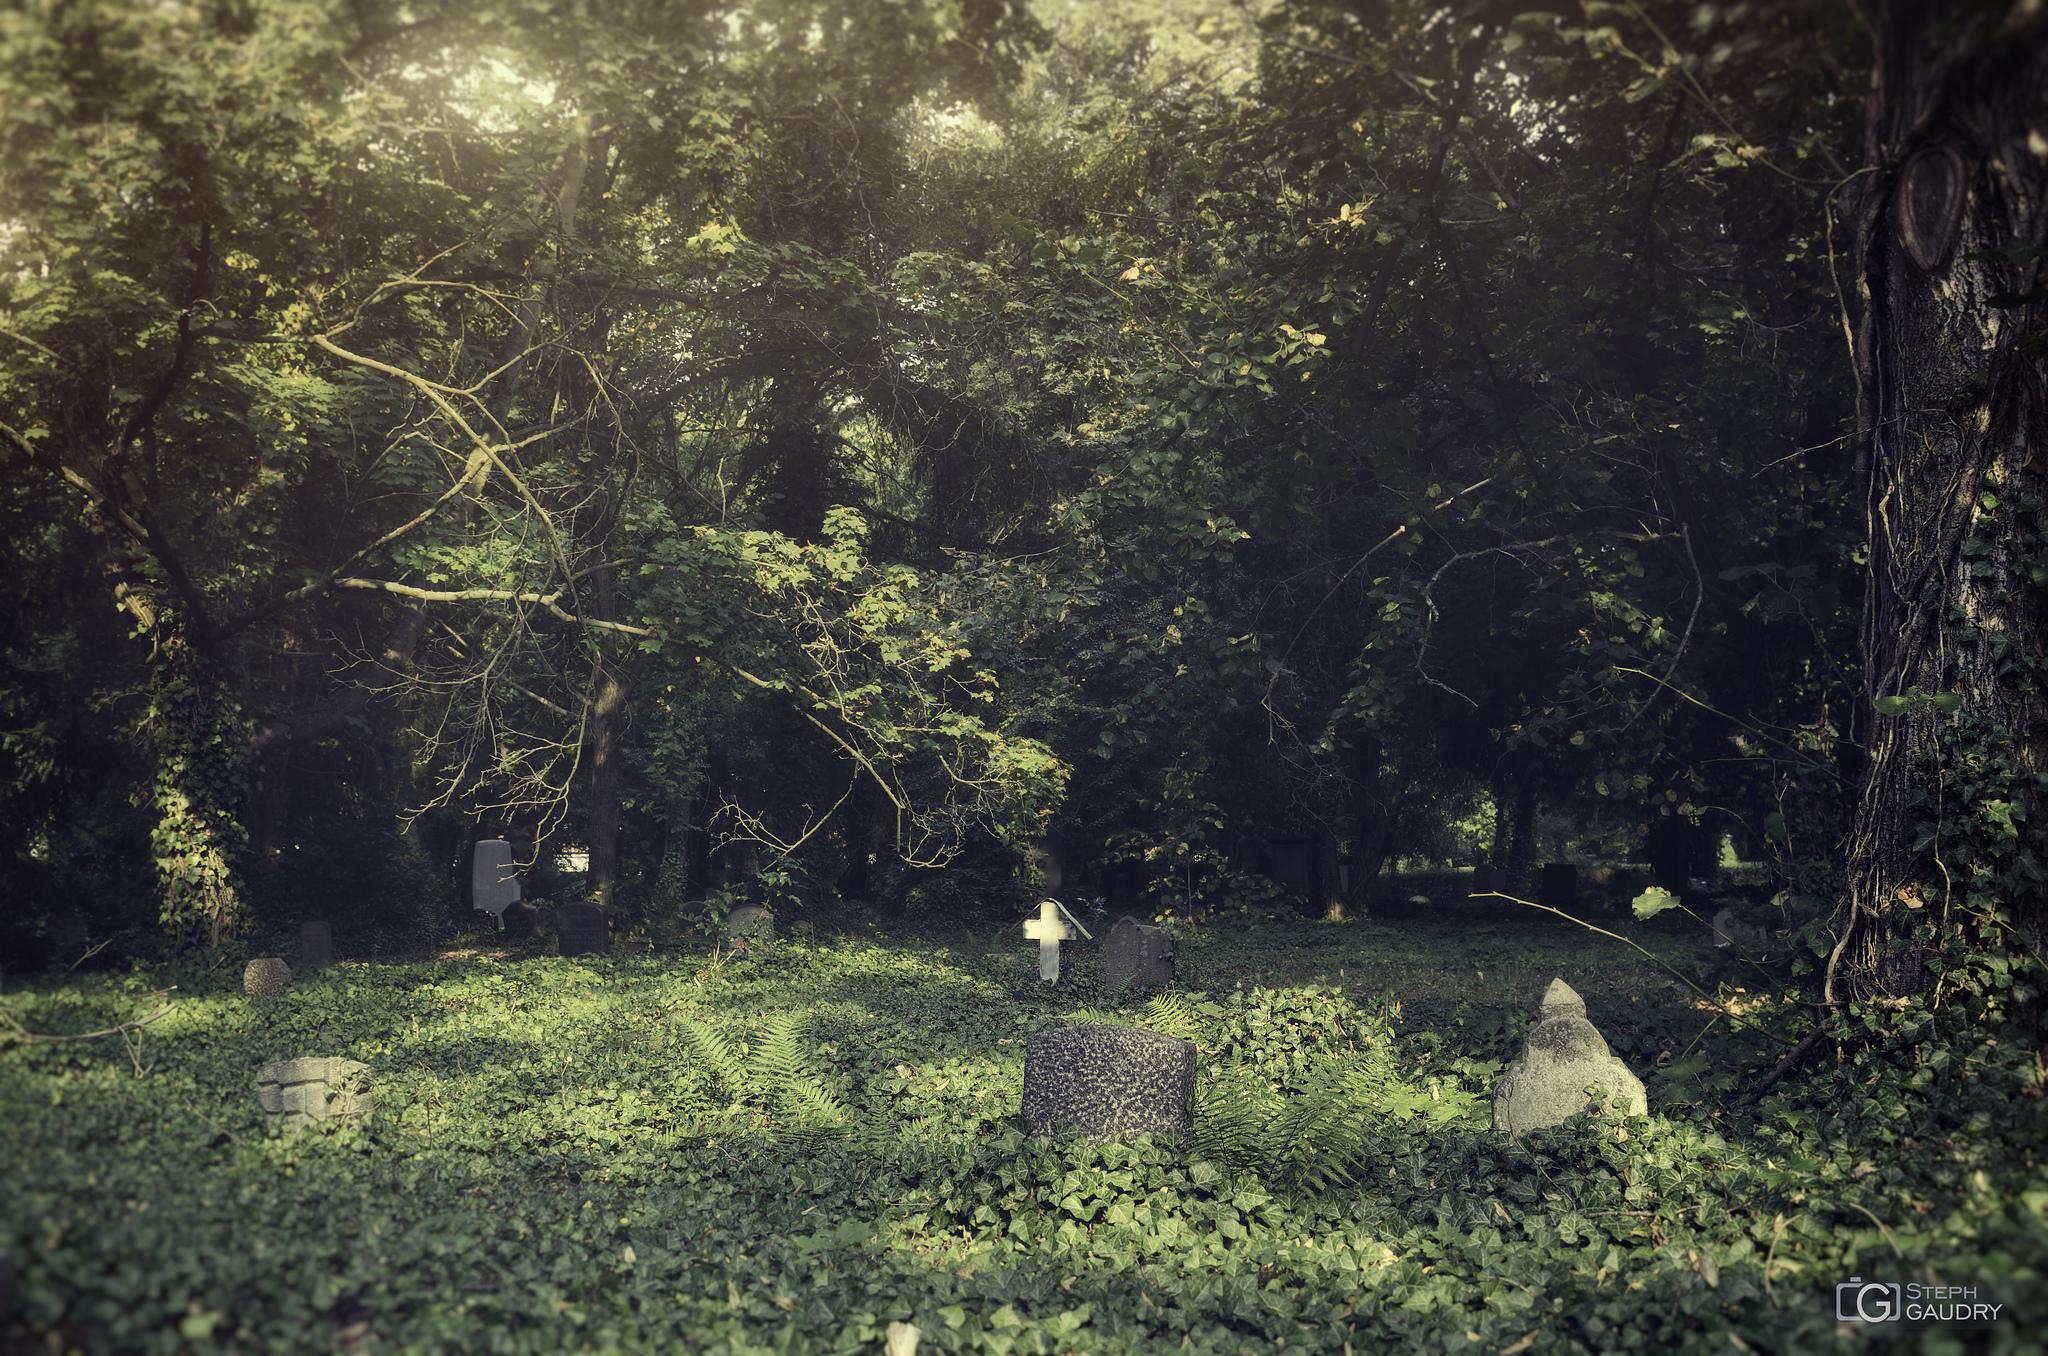 DR Cemetery (DEU) [Click to start slideshow]